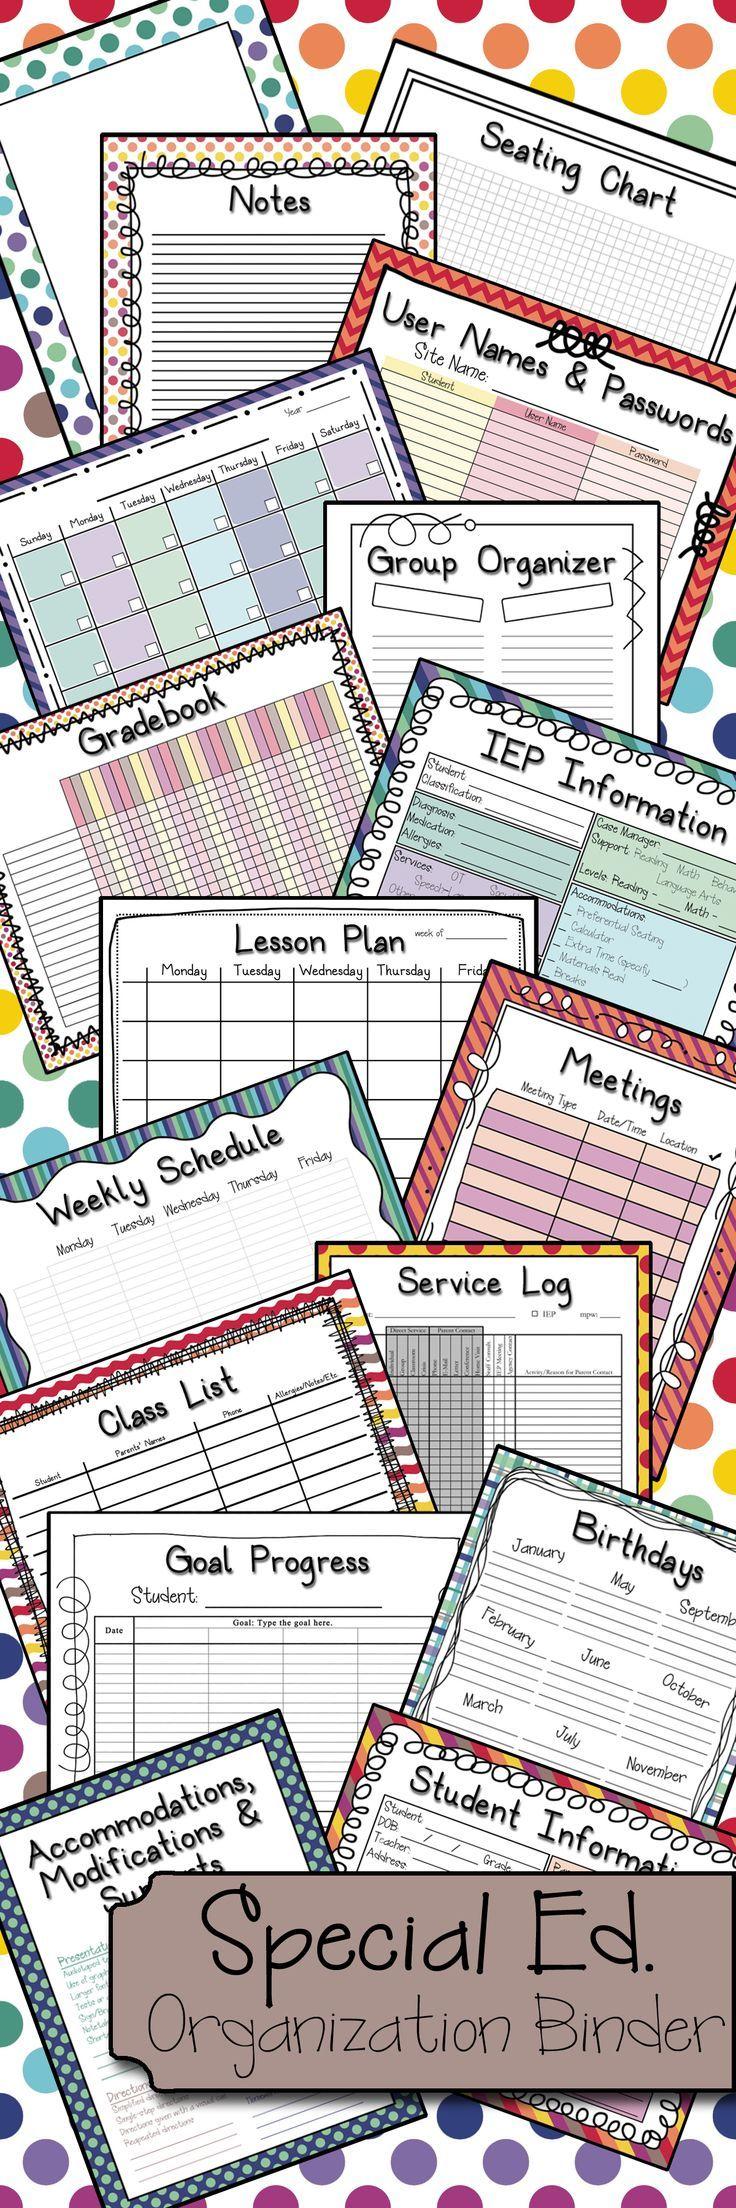 Special Ed Binder Warm Cool Color Combo Bundle Teacher - Special education teacher lesson plan template